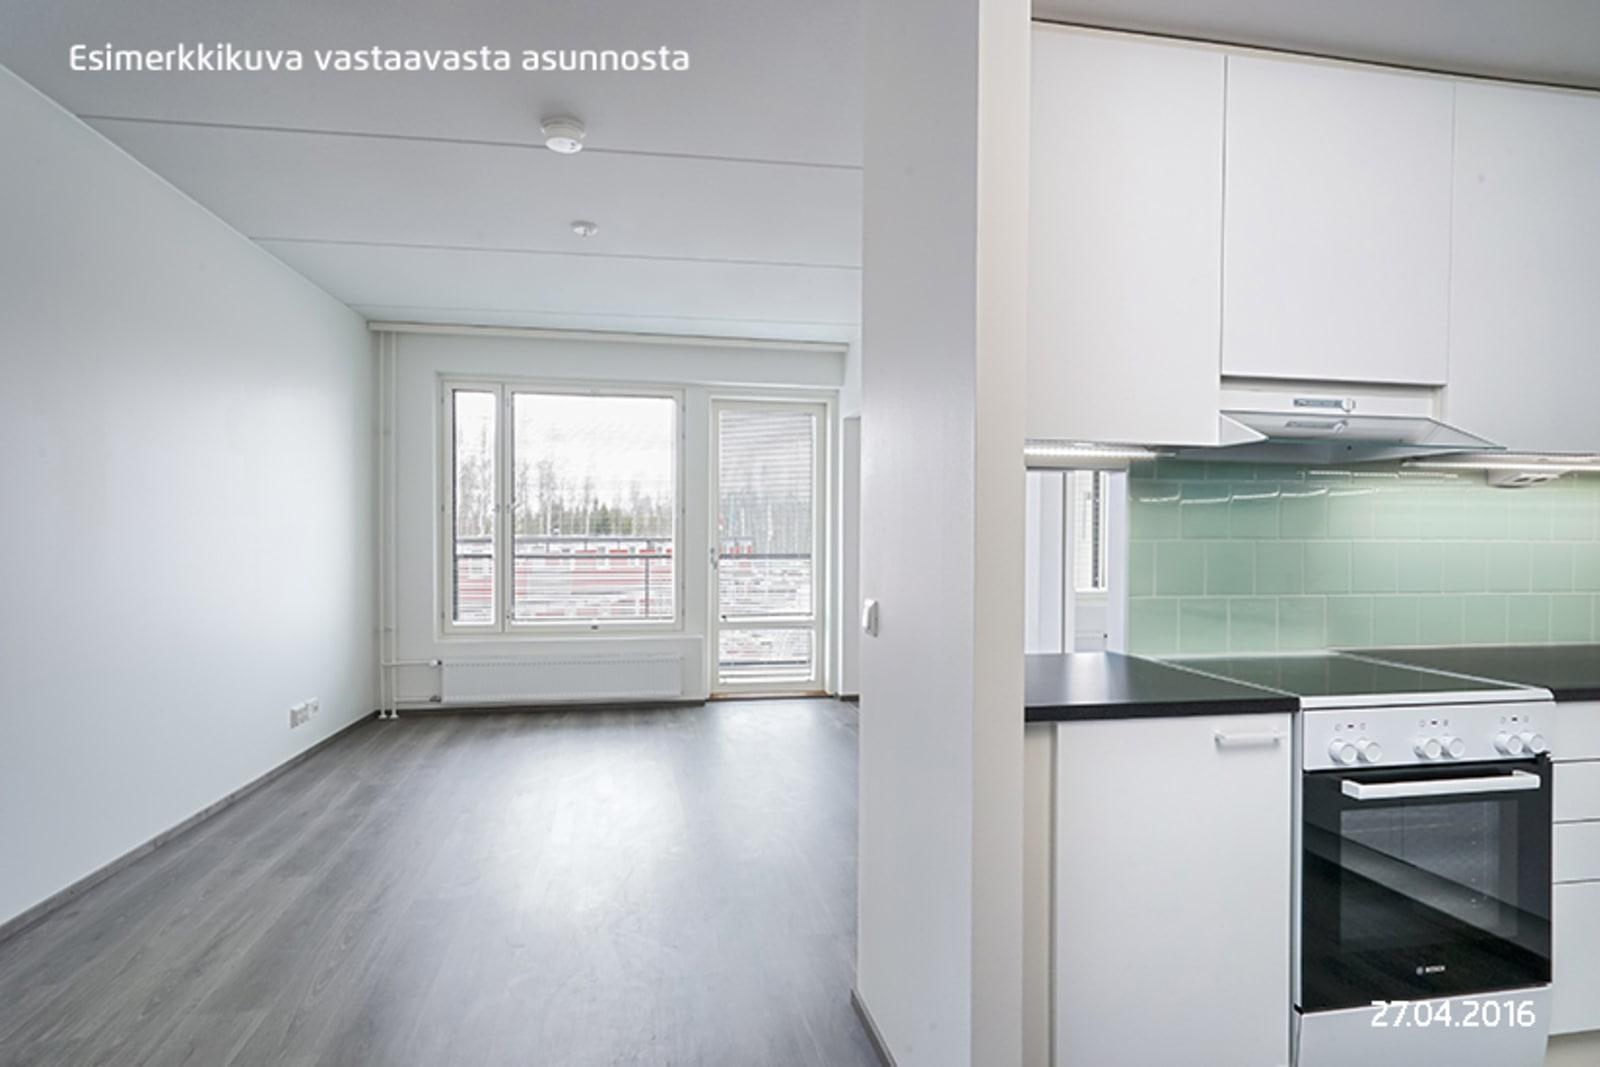 Vantaa, Keimolanmäki, Leksankuja 3 A 009